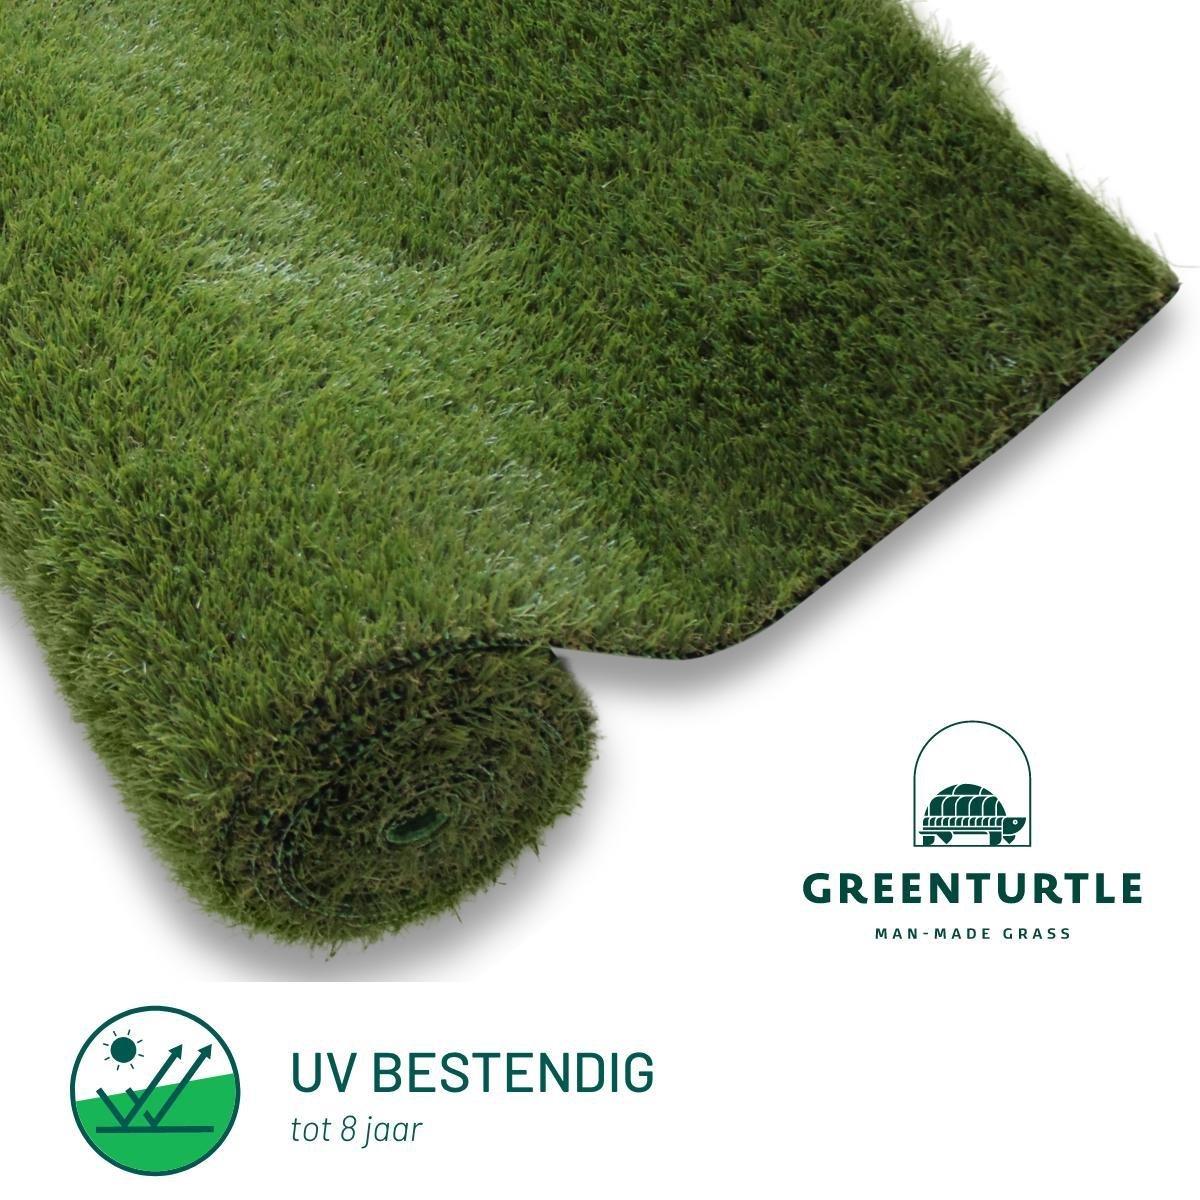 Green Turtle Kunstgras - Grastapijt 100x200cm - 26mm - Central Park - Artificieel Gras - Grastapijt